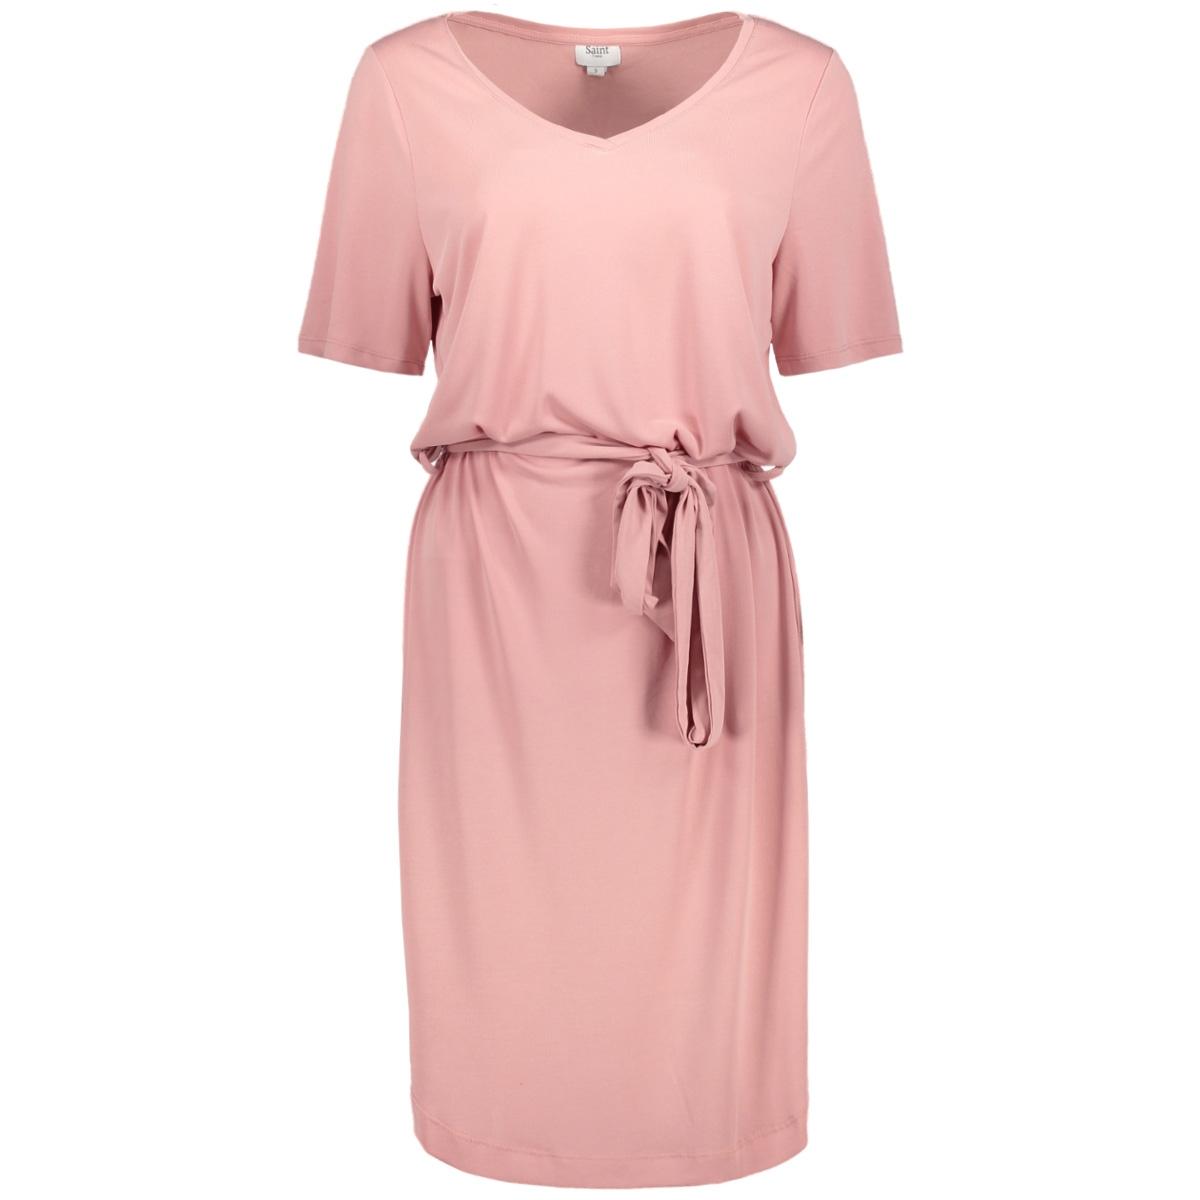 jersey dress u6501 saint tropez jurk 3282 p.rose